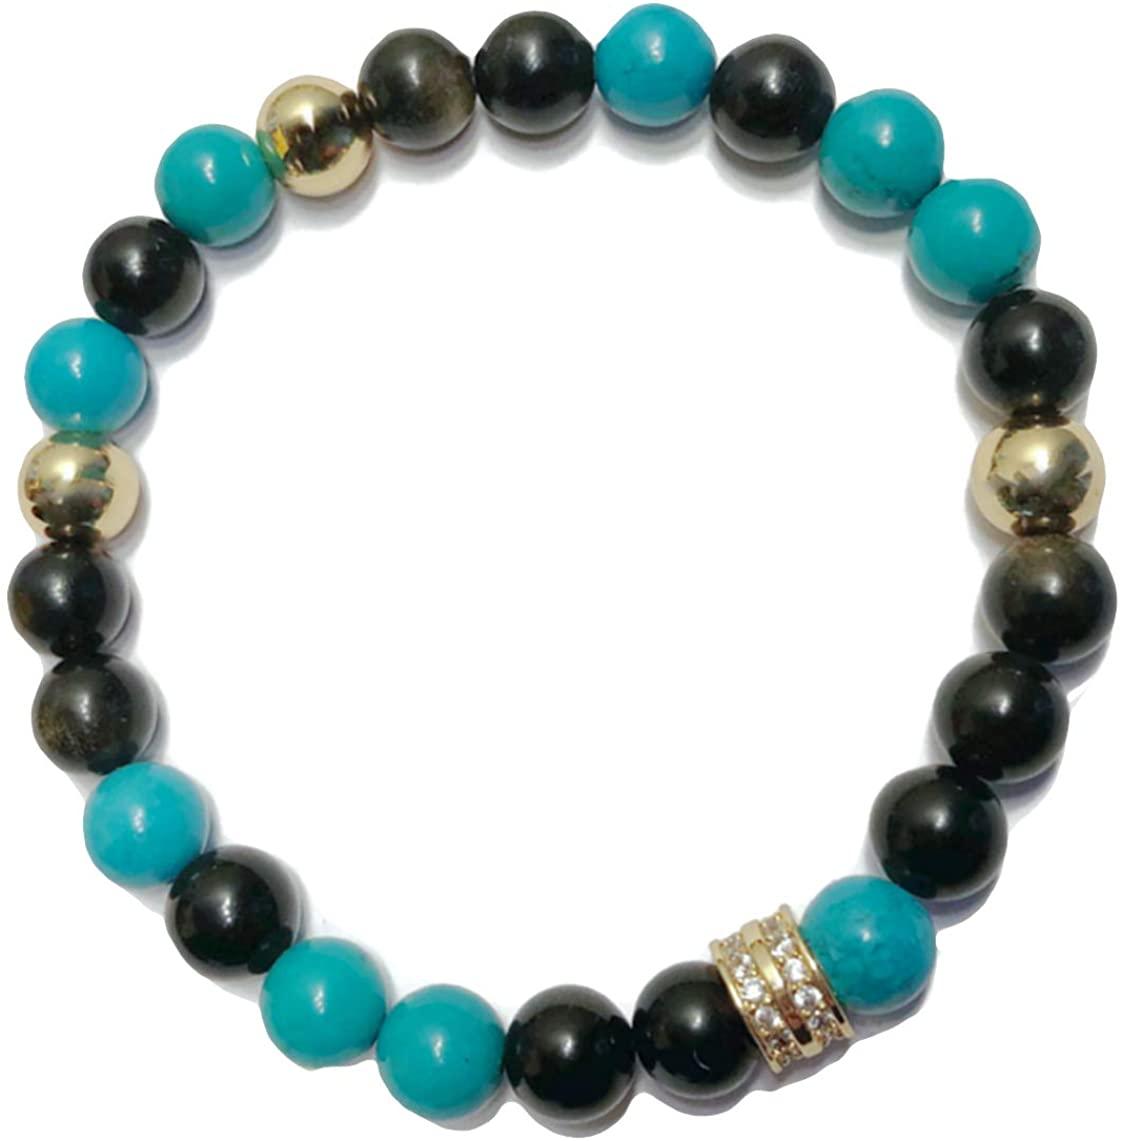 KarmaArm Healing | Wellness Self-Care Mantra Meditation Mala | Reiki Healing Energy Anxiety Calming Zen Chakra Yoga Wristband Bead Jewelry | Turquoise | Golden Obsidian